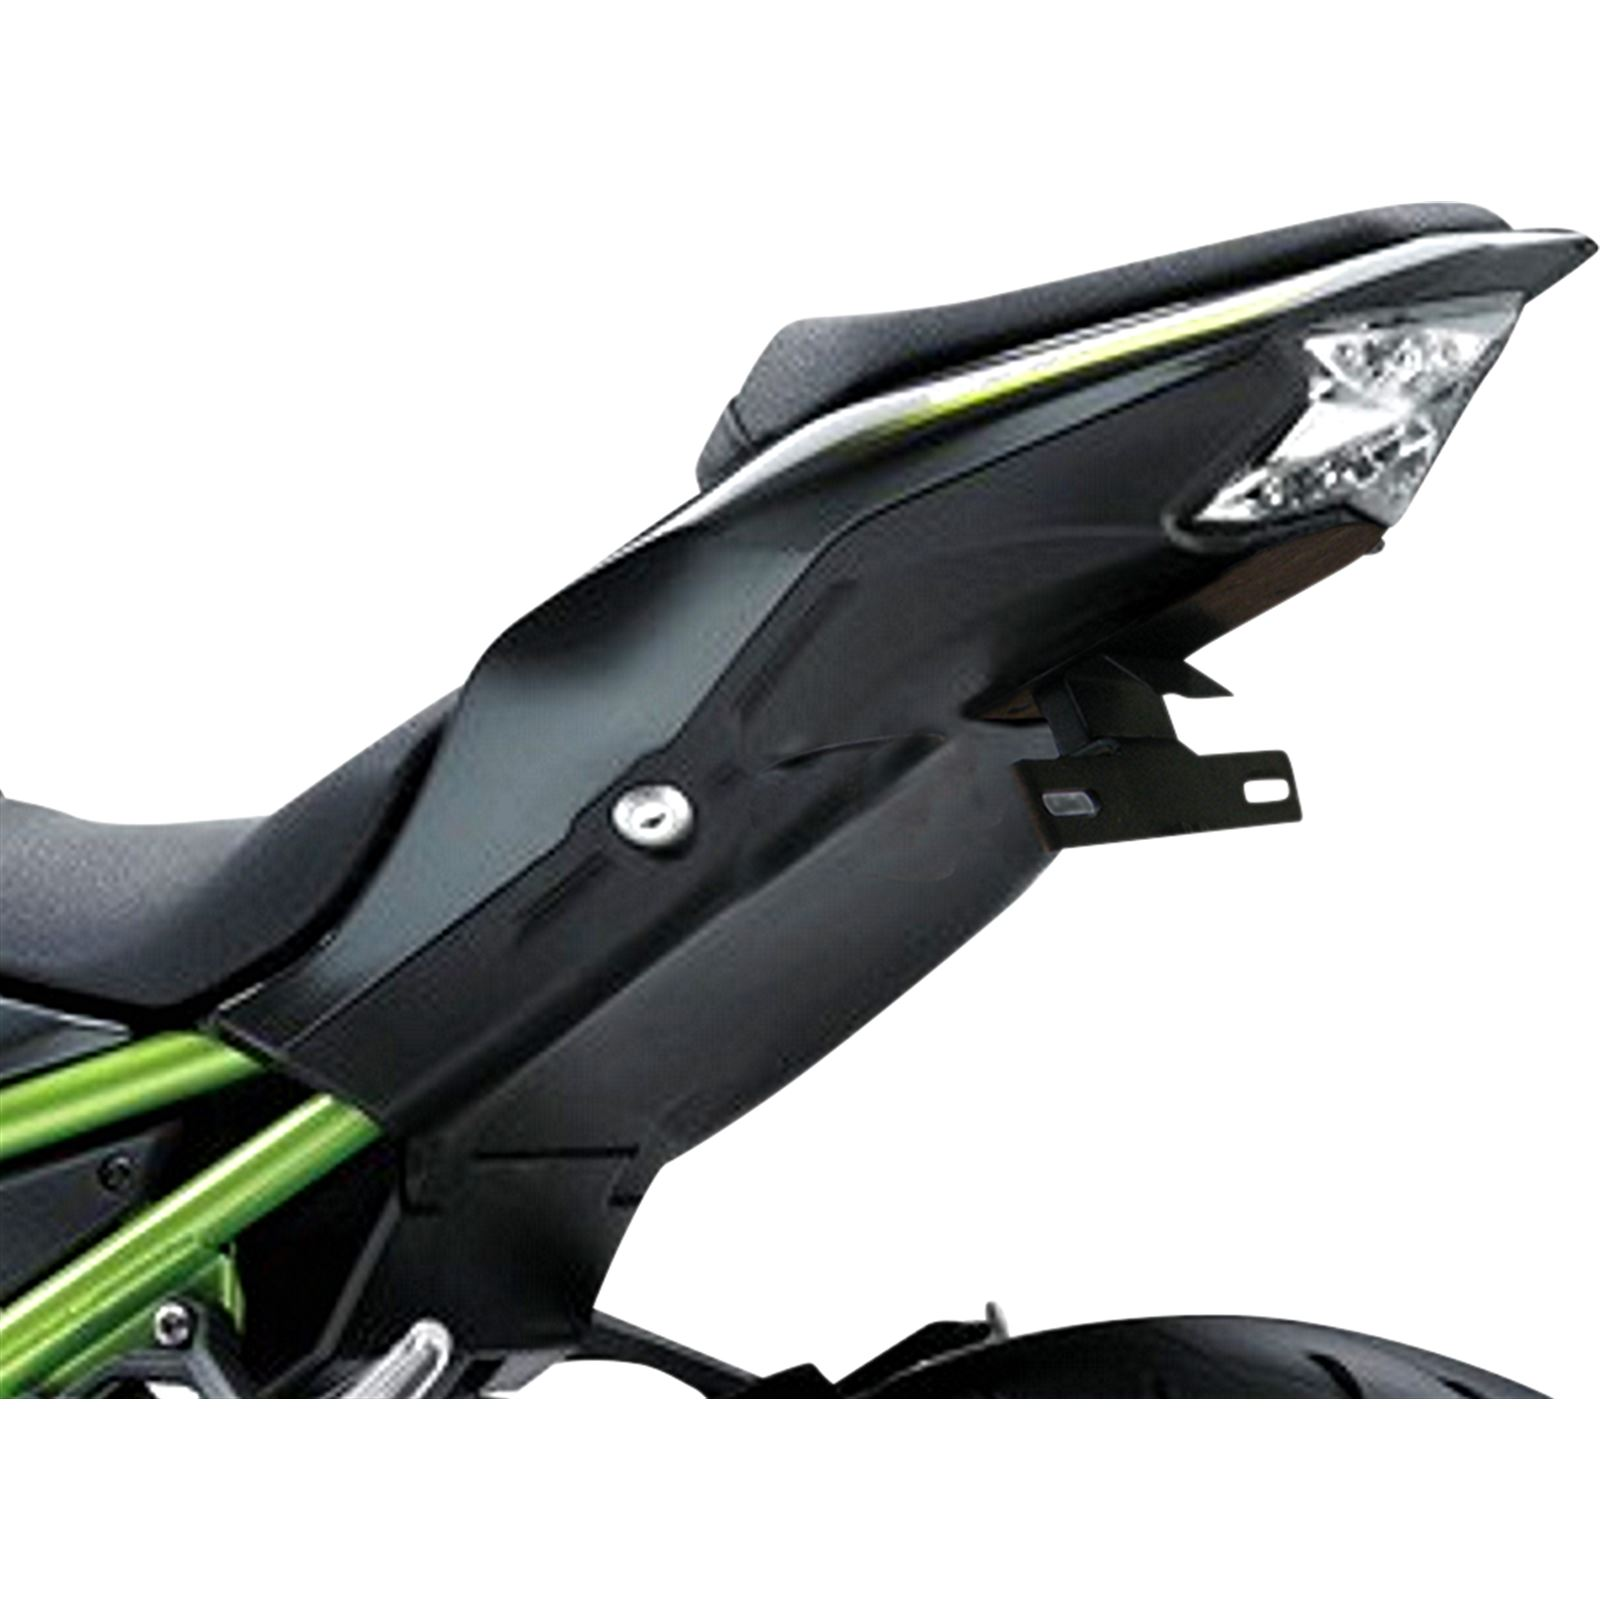 Targa X-Tail Kit for Kawasaki - No-Signal